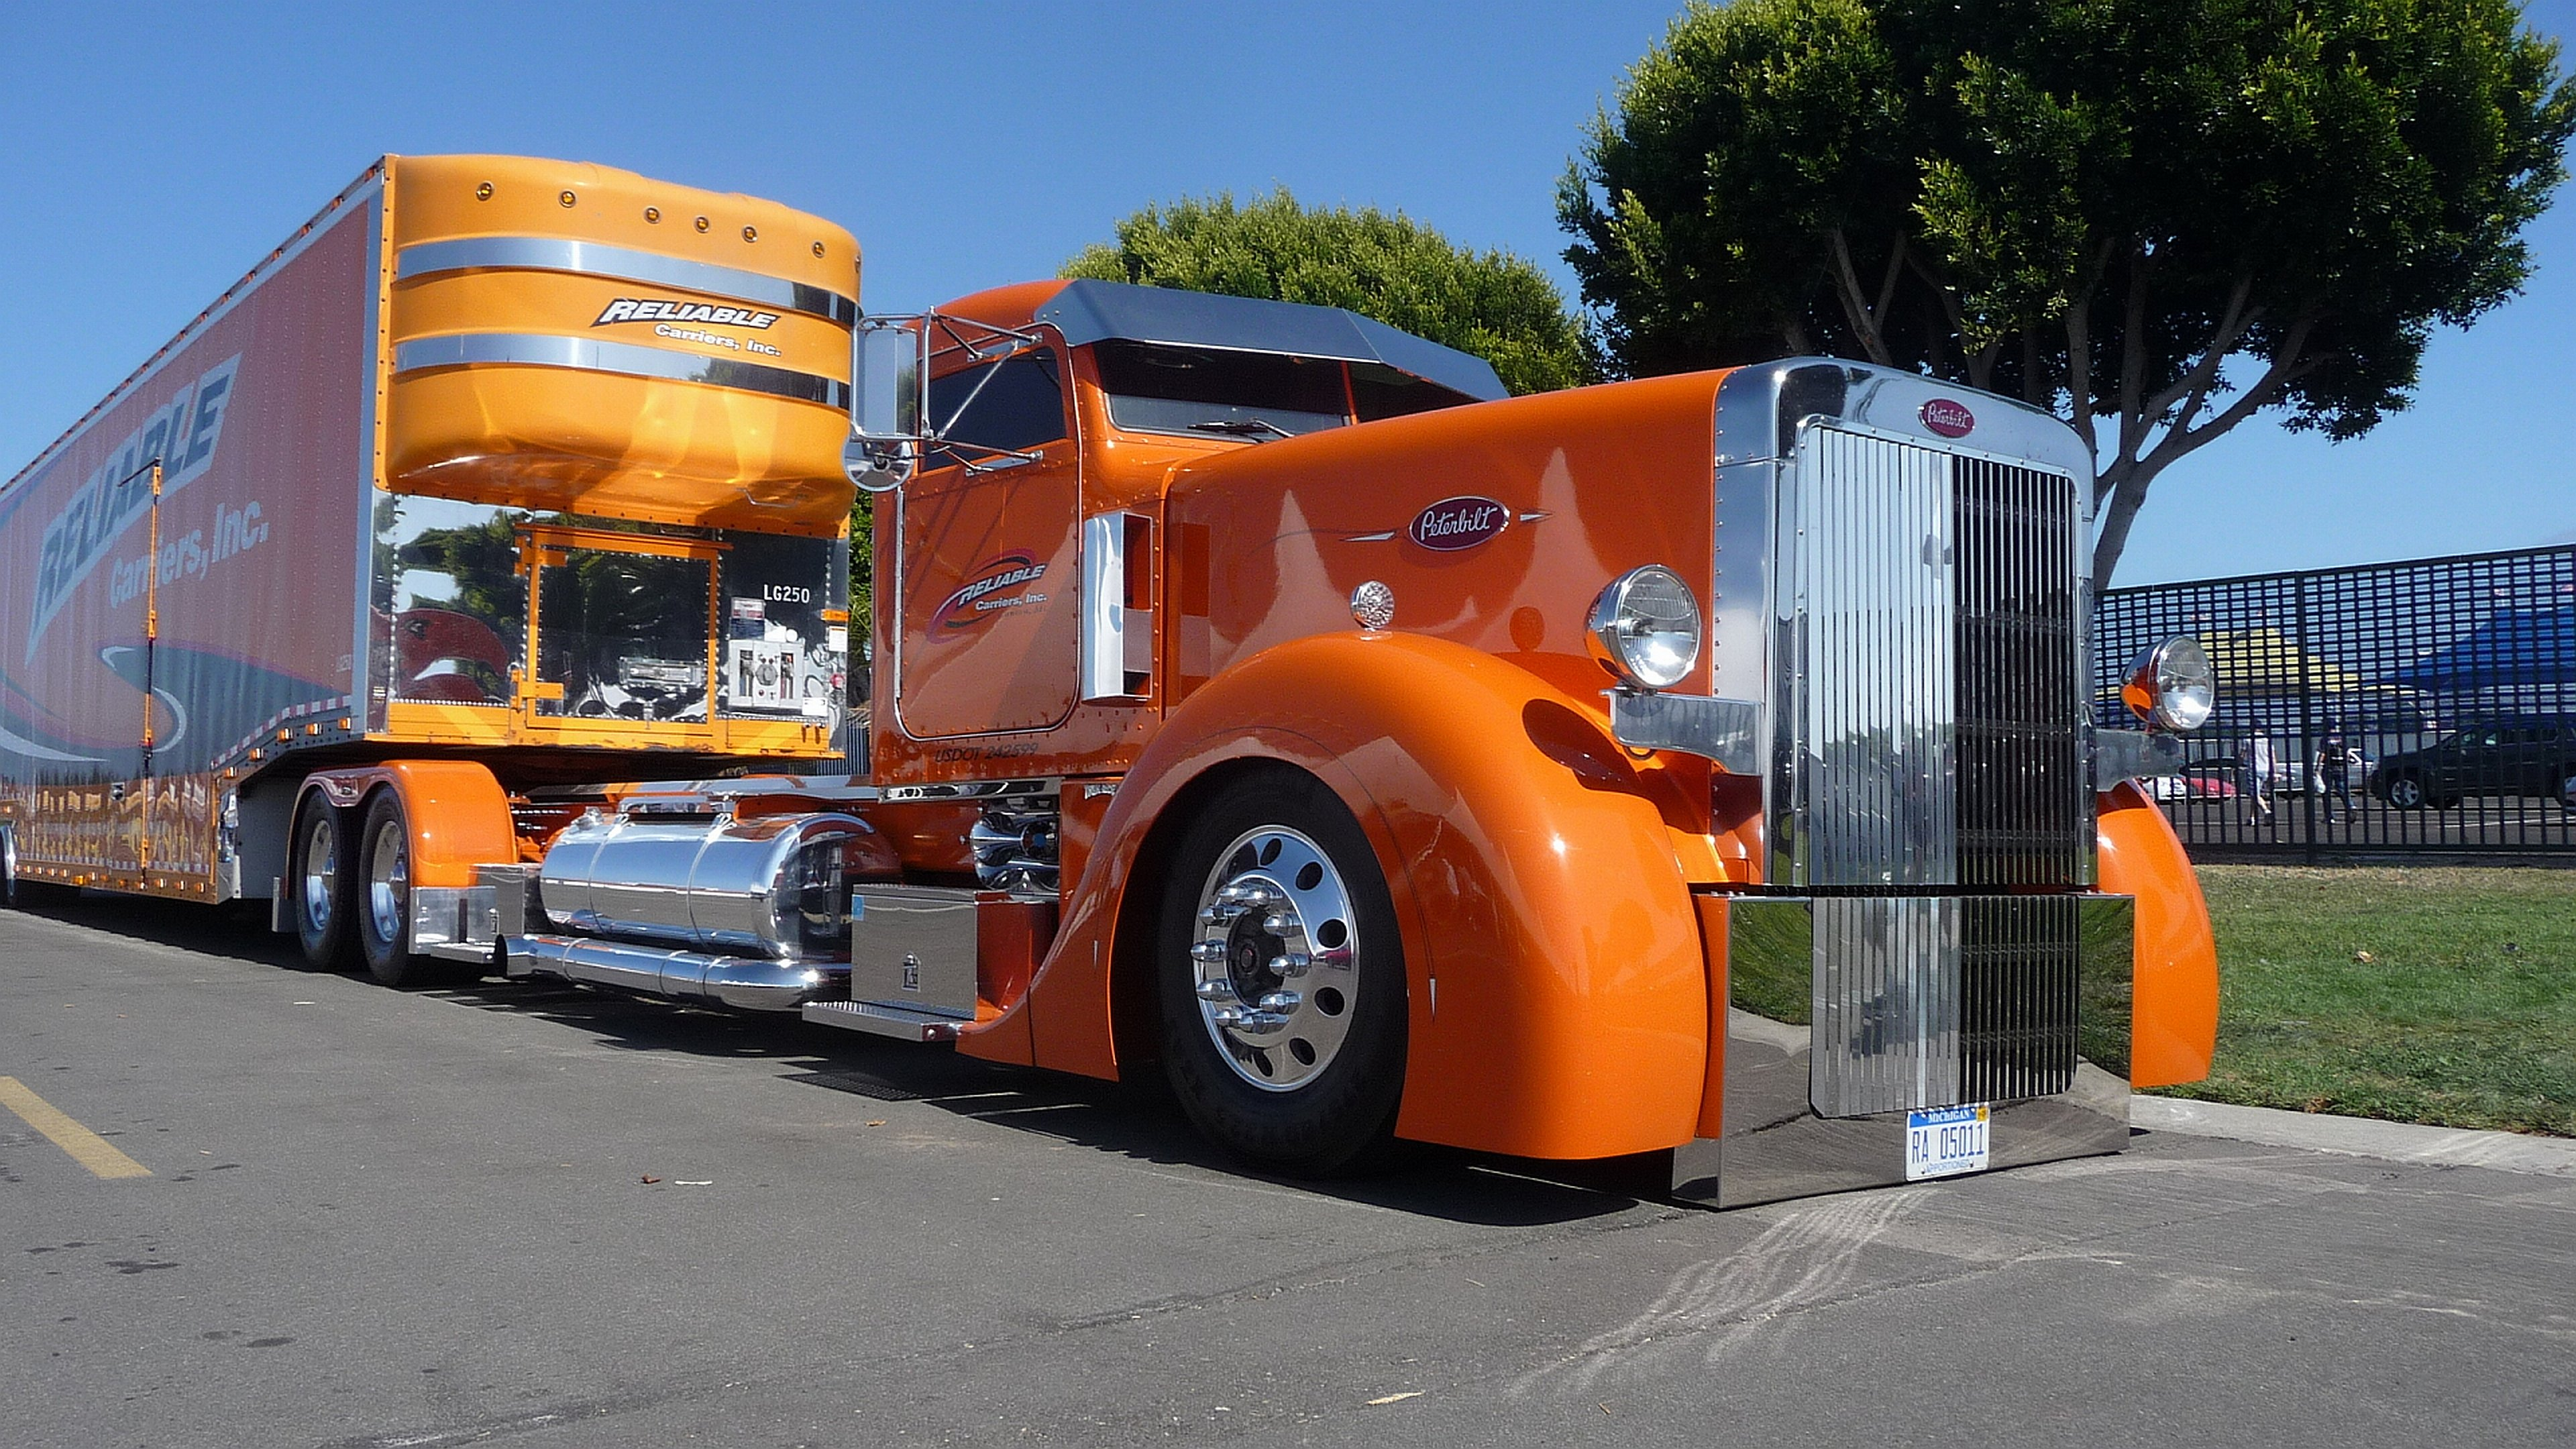 Truck Wallpaper 3 3840x2160